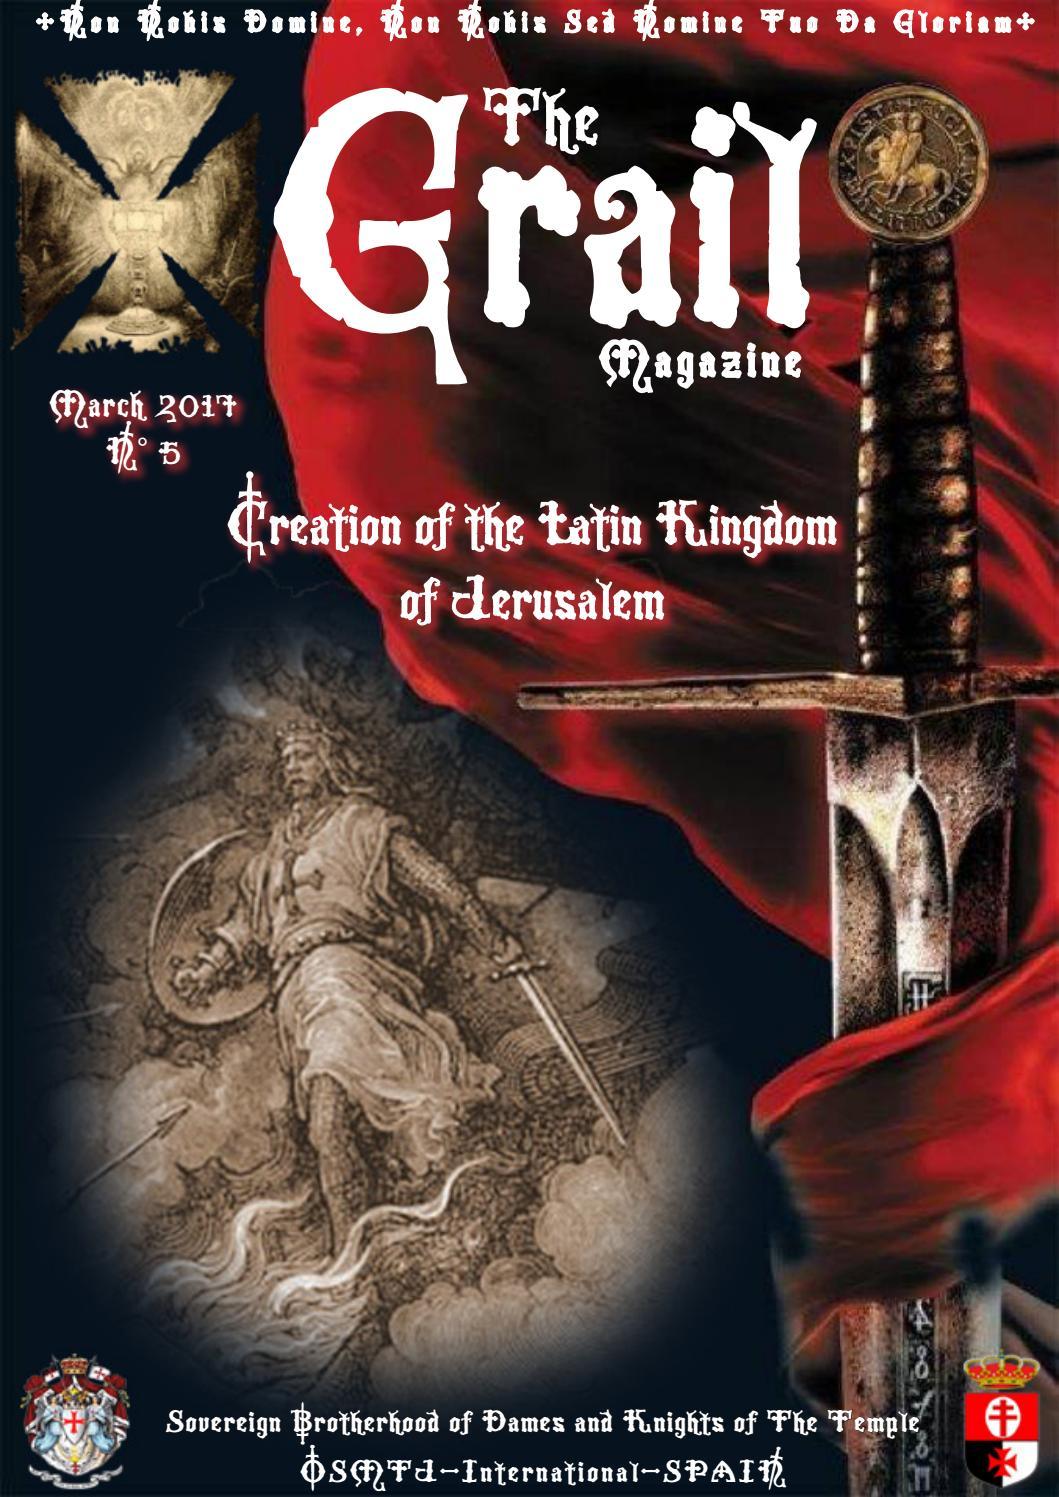 The graal magazine 05 march 2017 by Fuensanta Santos - issuu